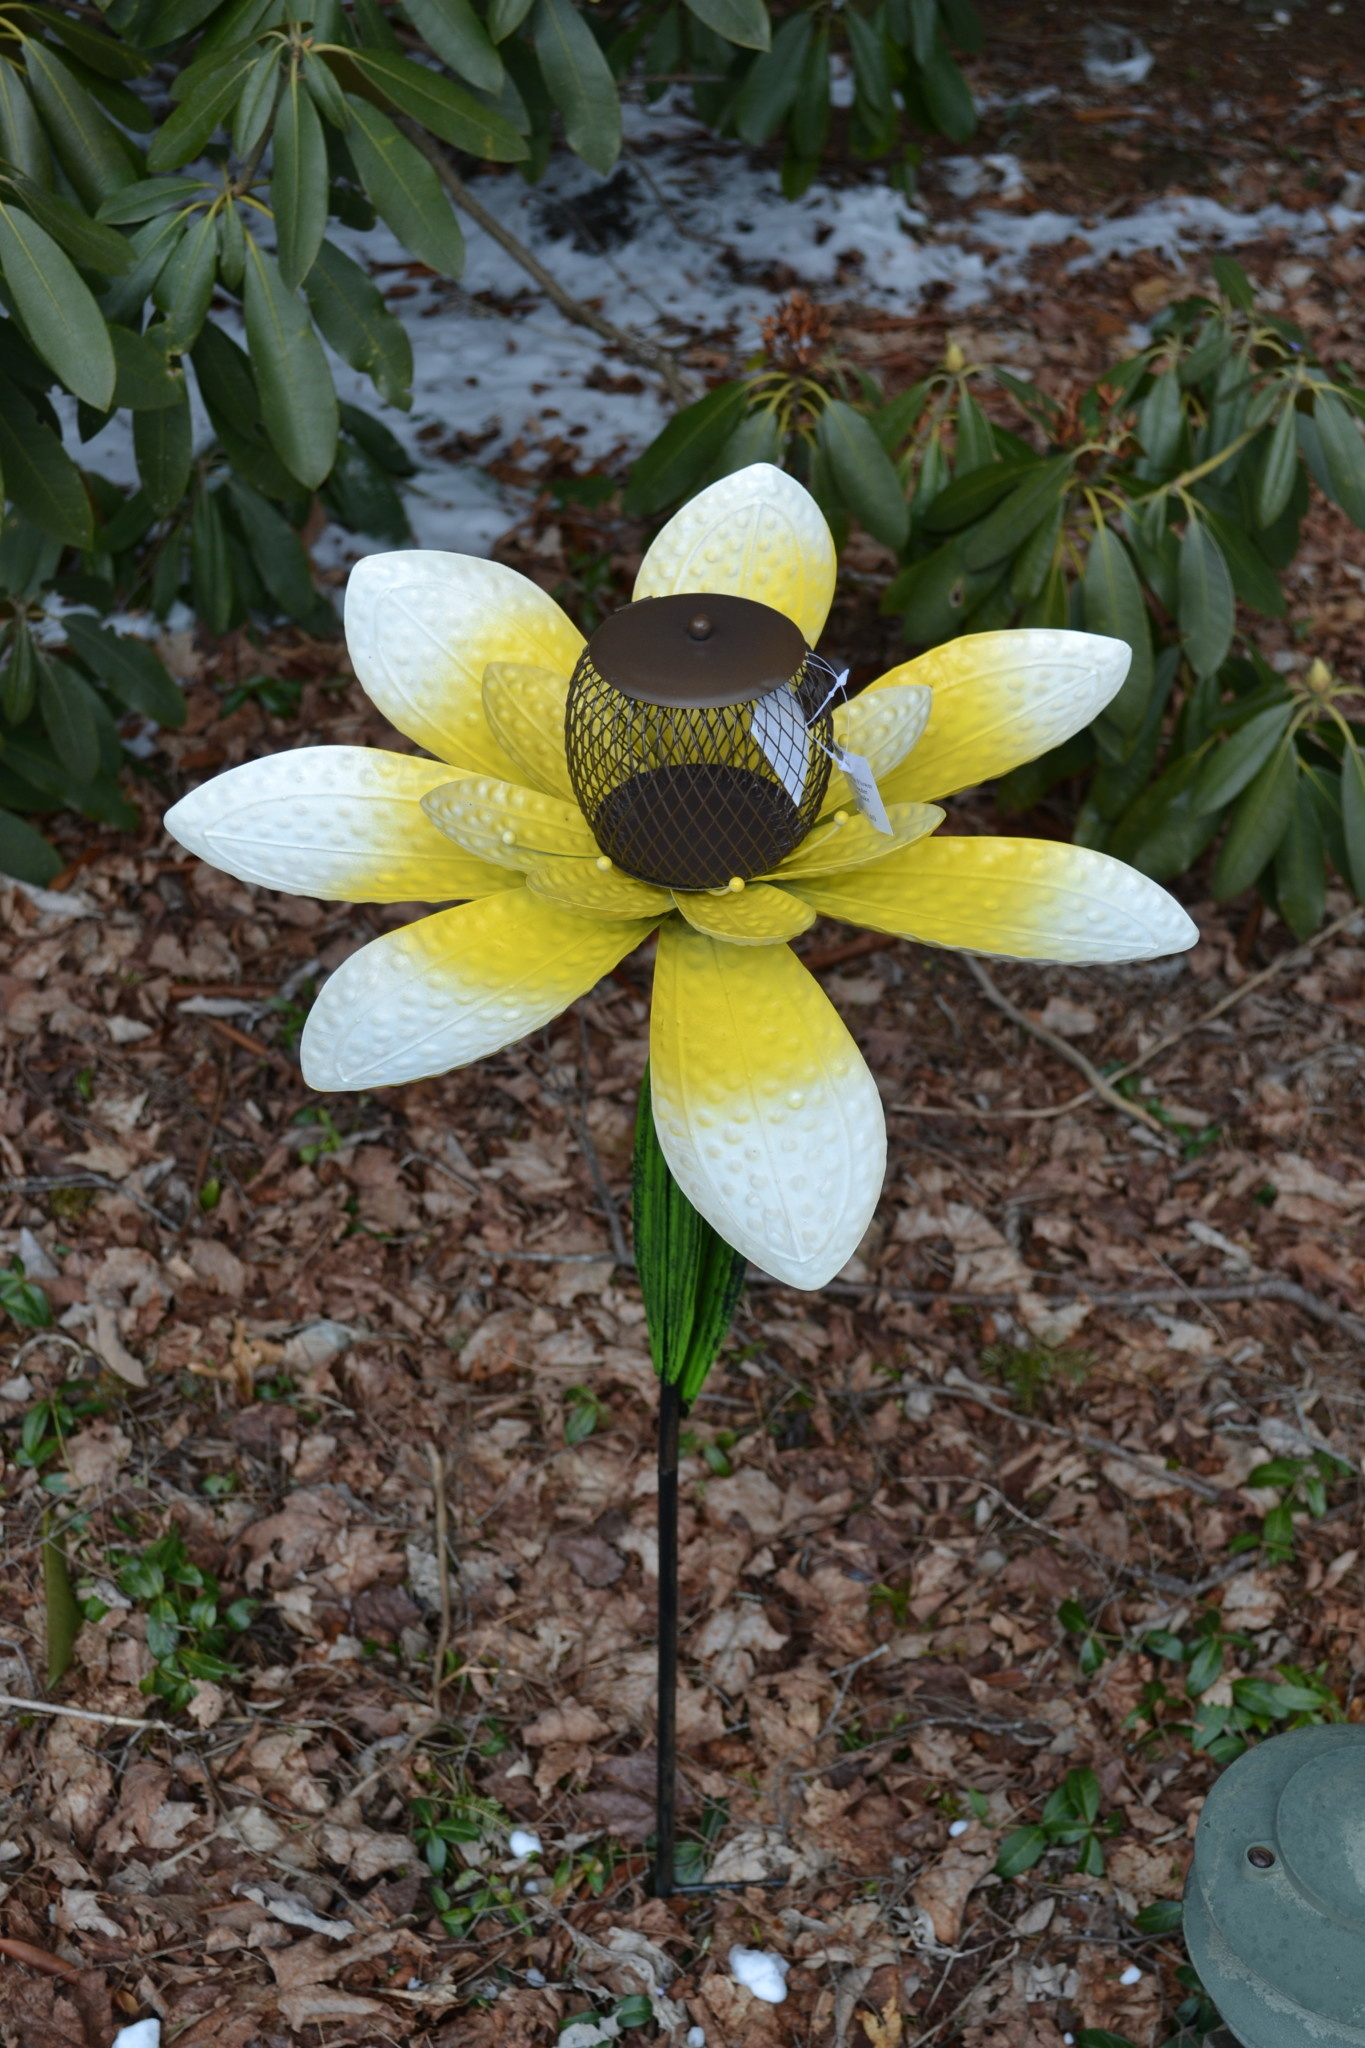 Dimpled Metal Flower Bird Feeder Stake (3-Colors)